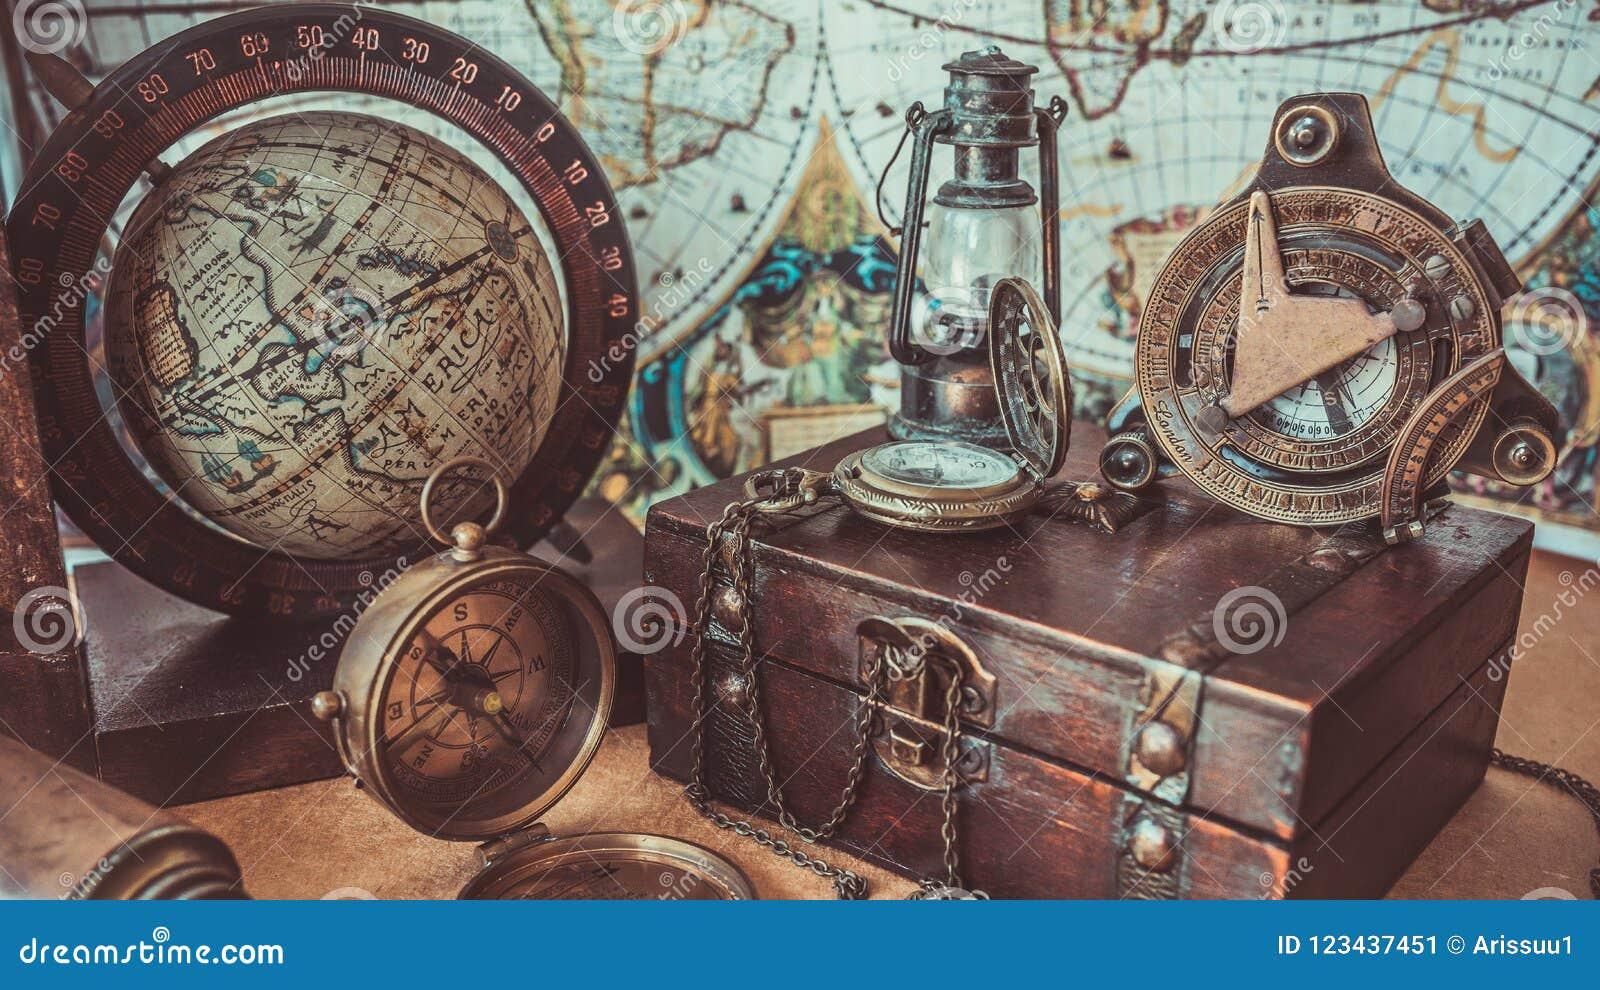 Vintage Compass Globe Model Lantern Lighting Watch And Globe Model Maritime Nautical Navigation Photos